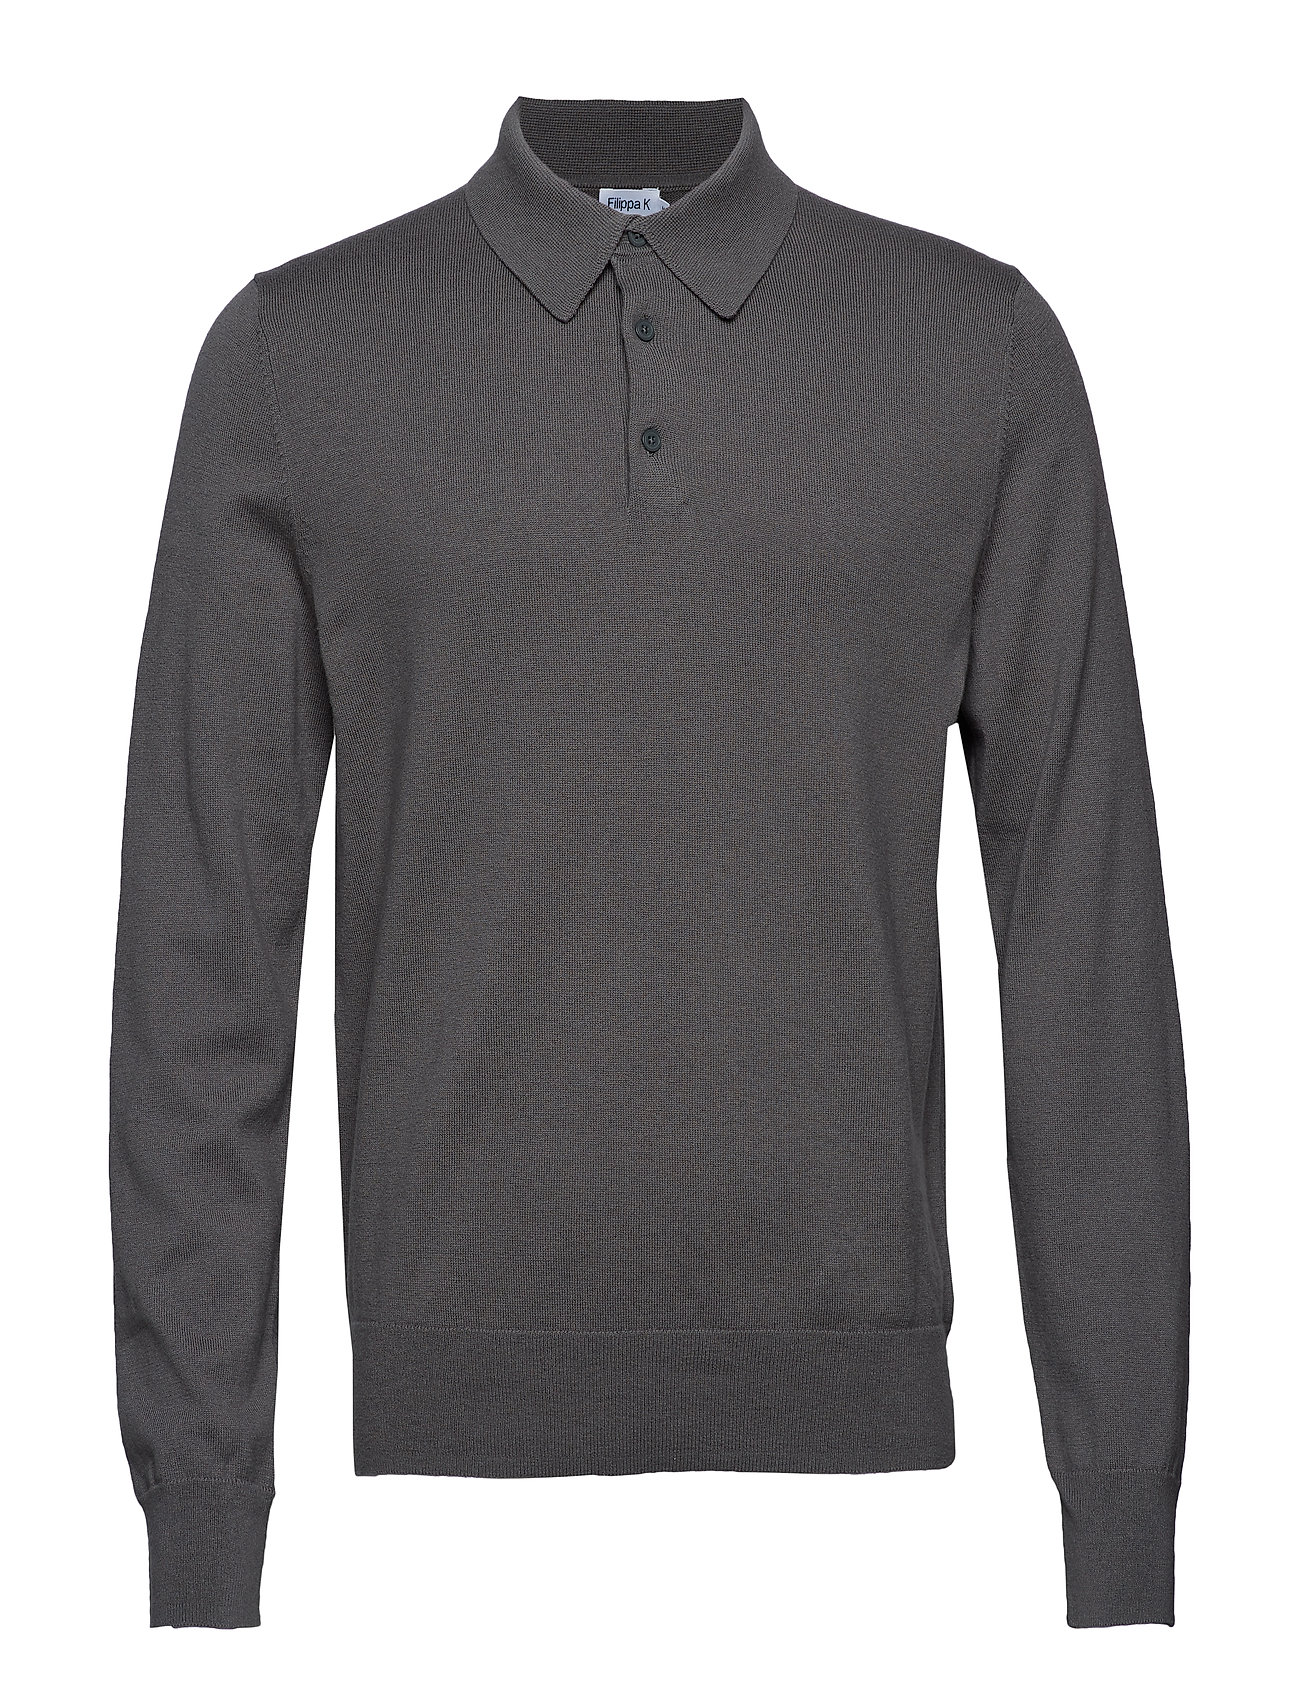 Filippa K M. Knitted Polo Shirt - PLATOONE